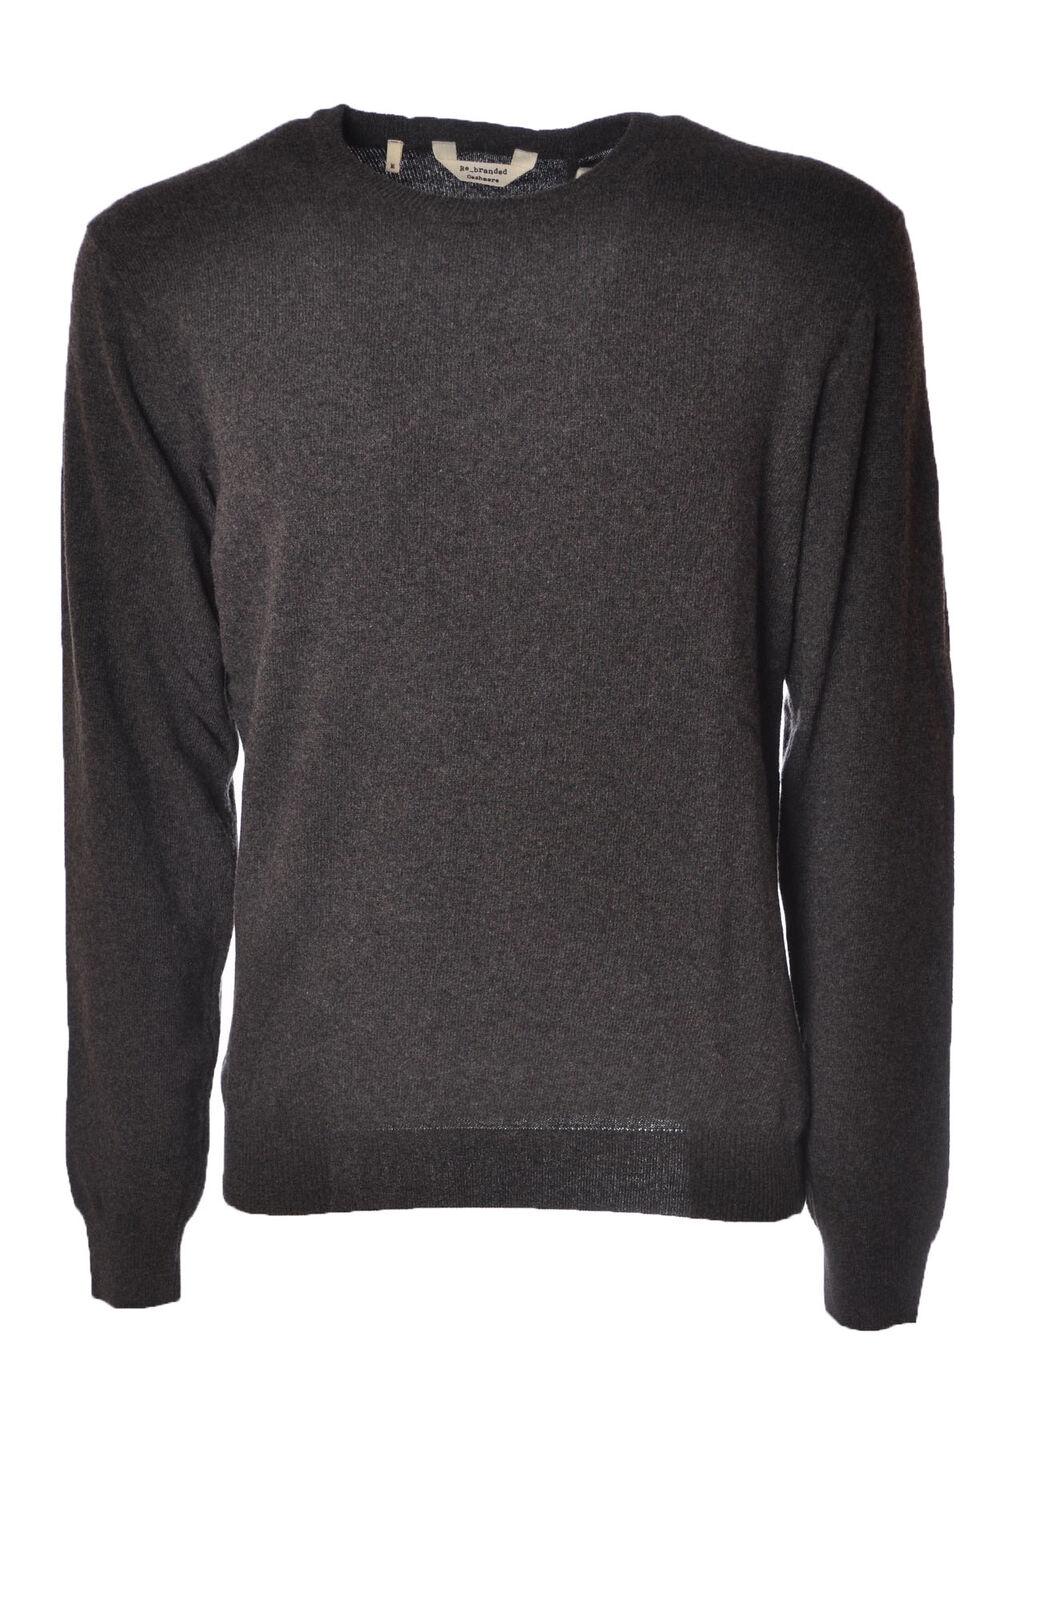 Re_Branded - Maglieria-Pullover -  Herren - Grigio - 4405528M184552